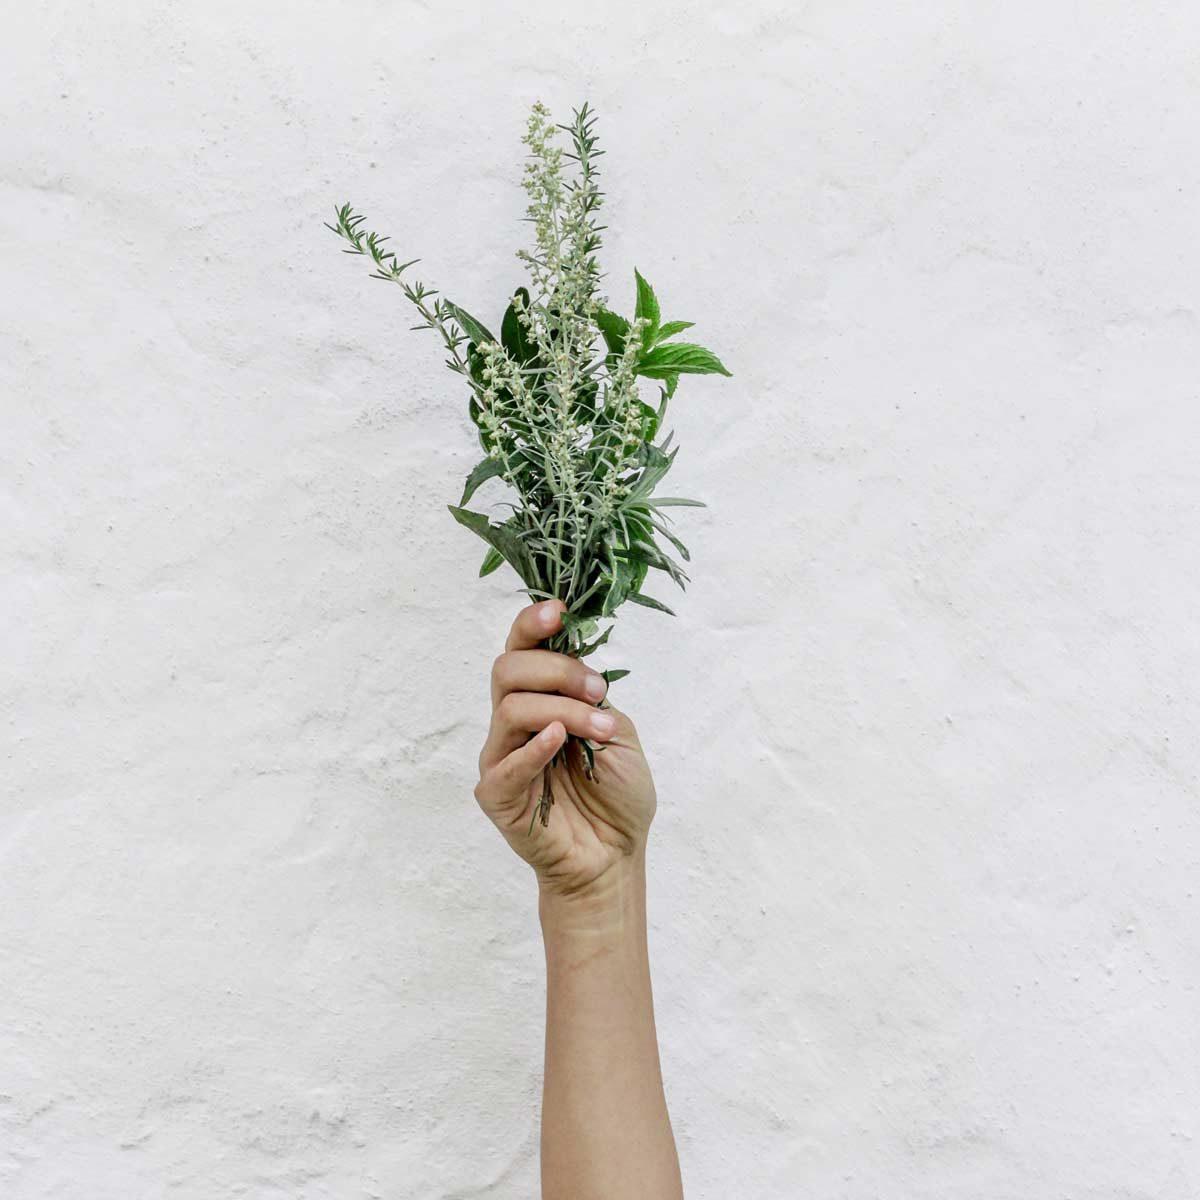 herbal-medicine-in-hand-1200x1200.jpg